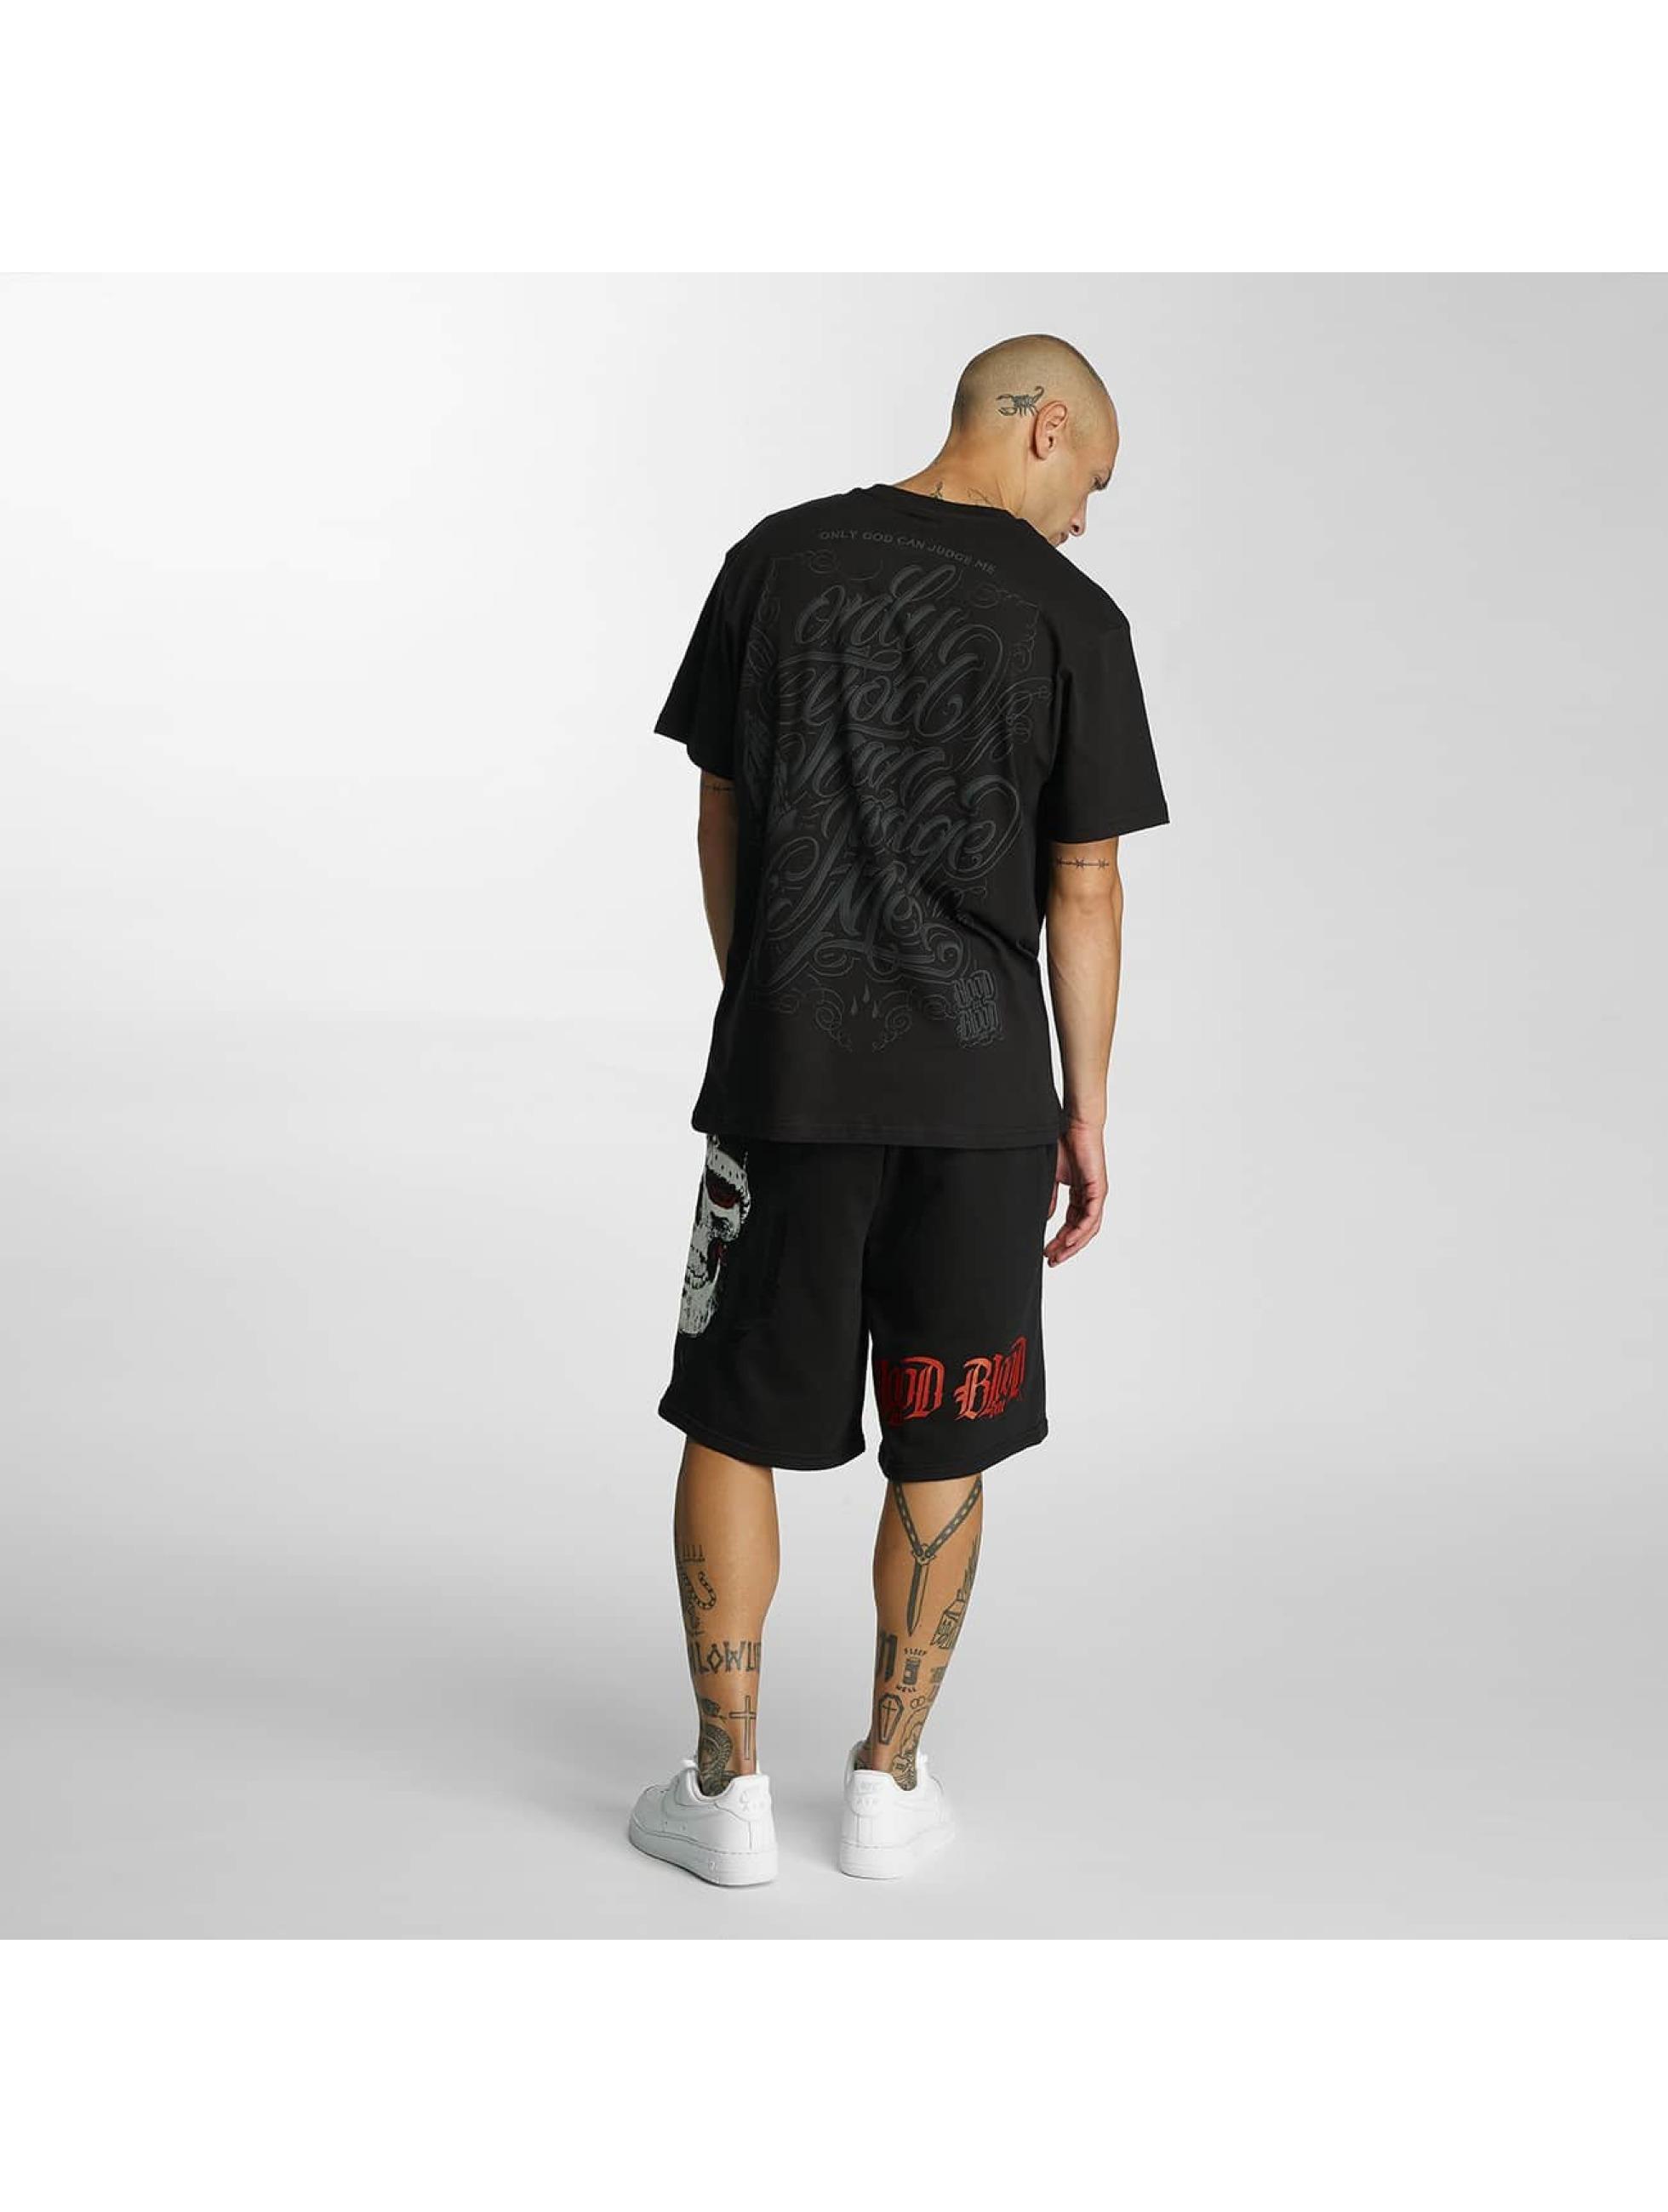 Blood In Blood Out T-Shirt God Judge black